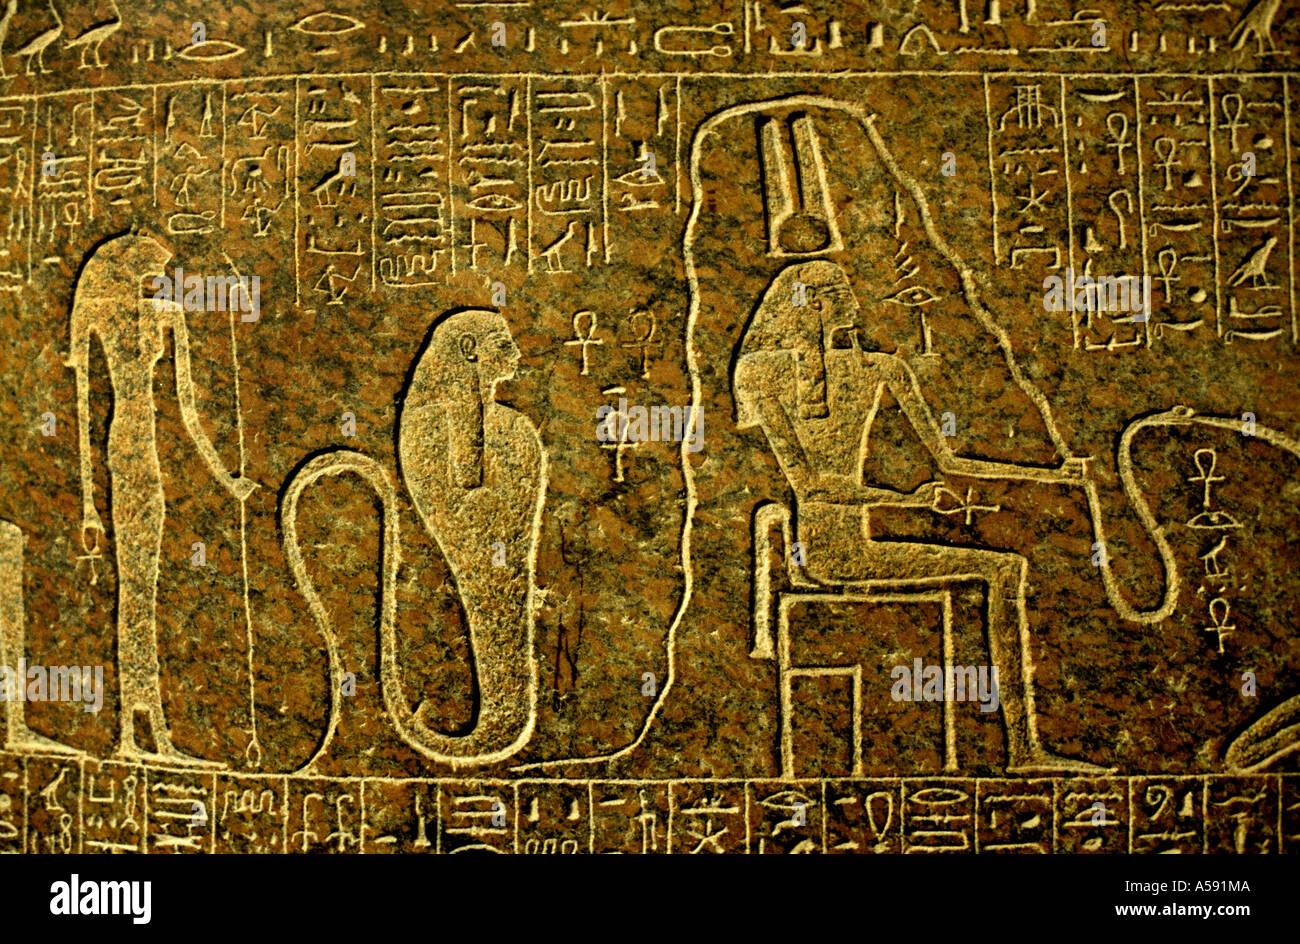 Hieroglyph Hieroglyphic Hieroglyphics Painting Stock Photo